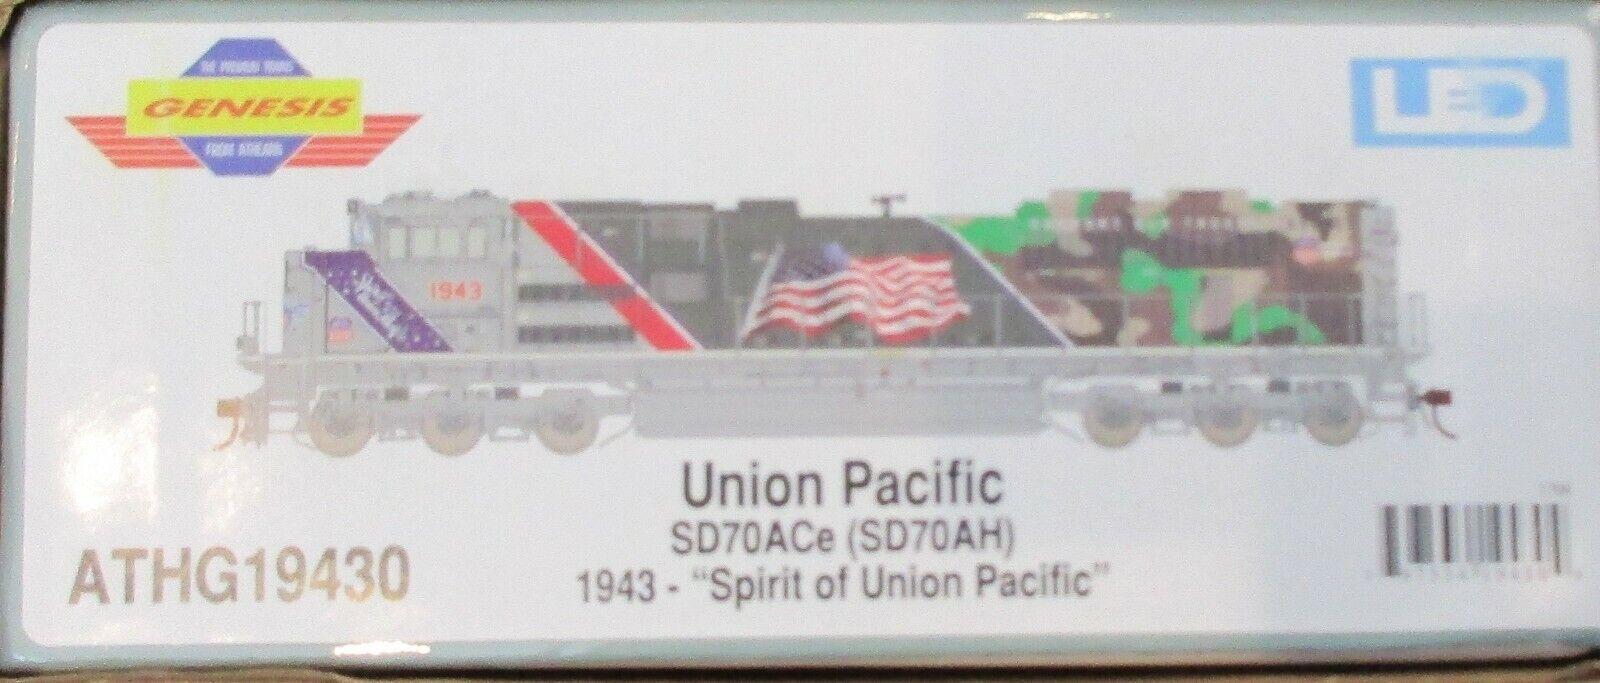 Escala Ho Athearn Genesis SD70ACe Union Pacific  1943 - Dc-athg 019430